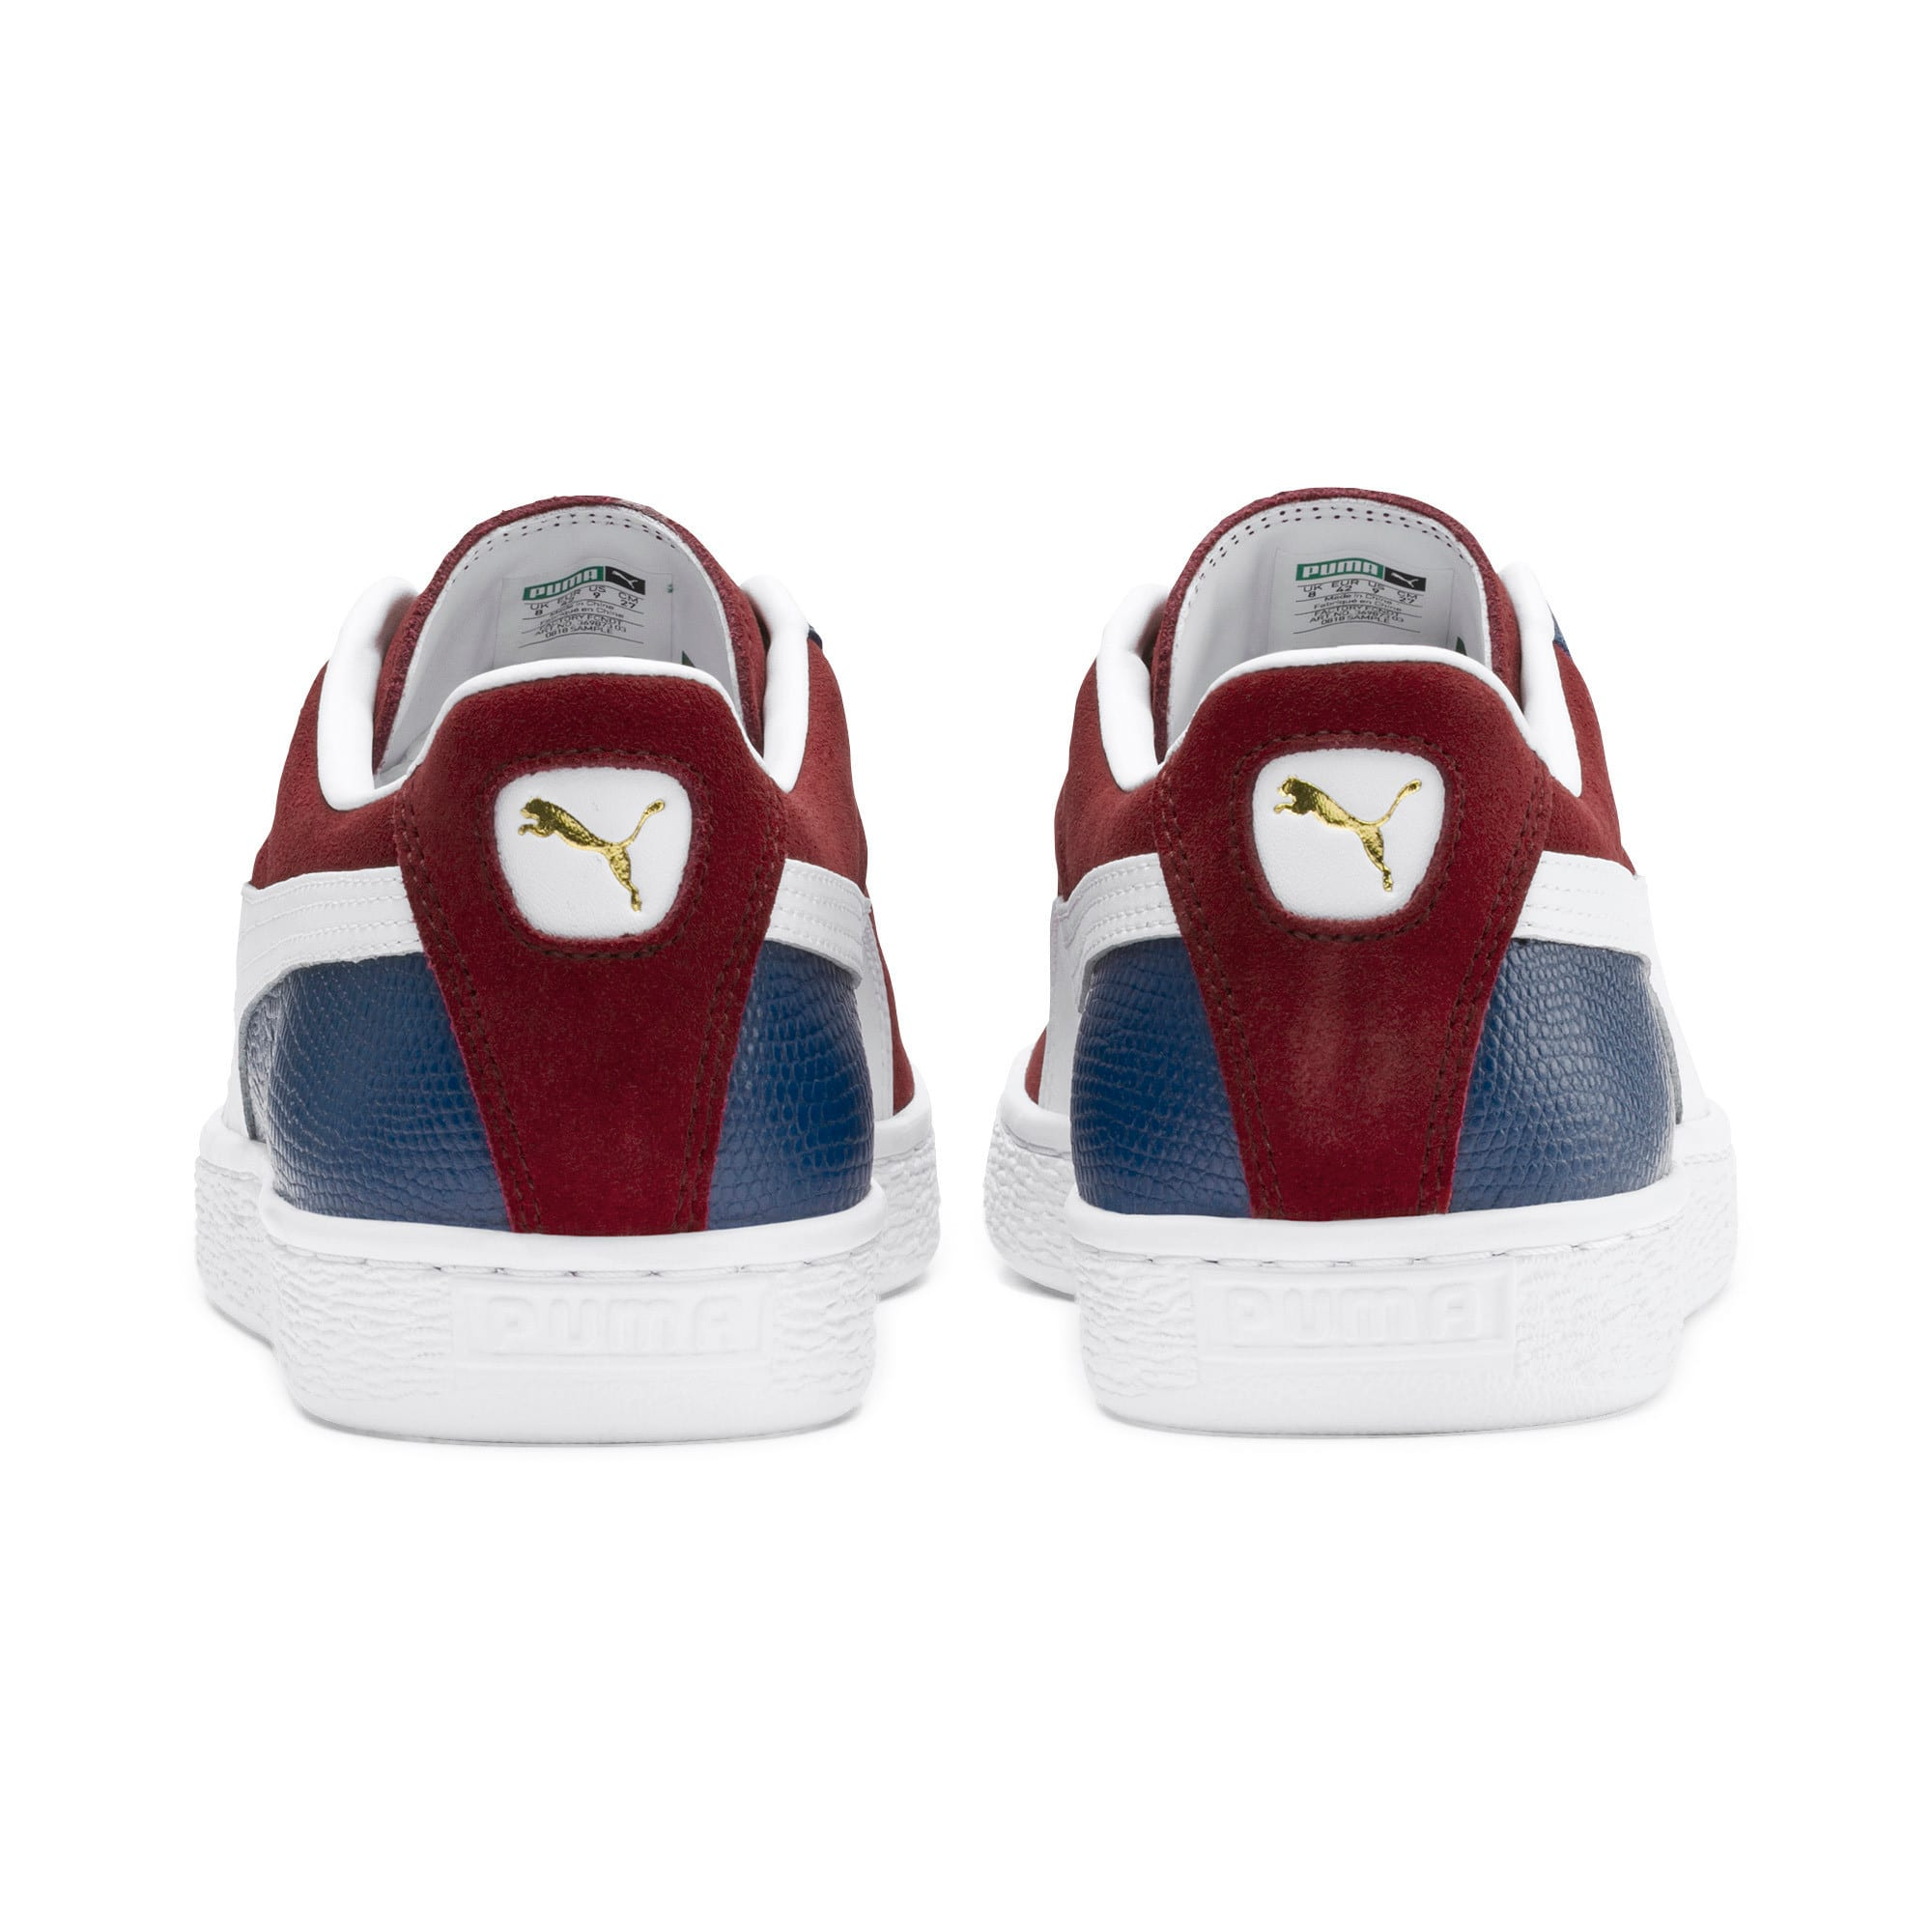 Thumbnail 4 of Suede Classic Block Sneakers, Rhubarb- Blue-White, medium